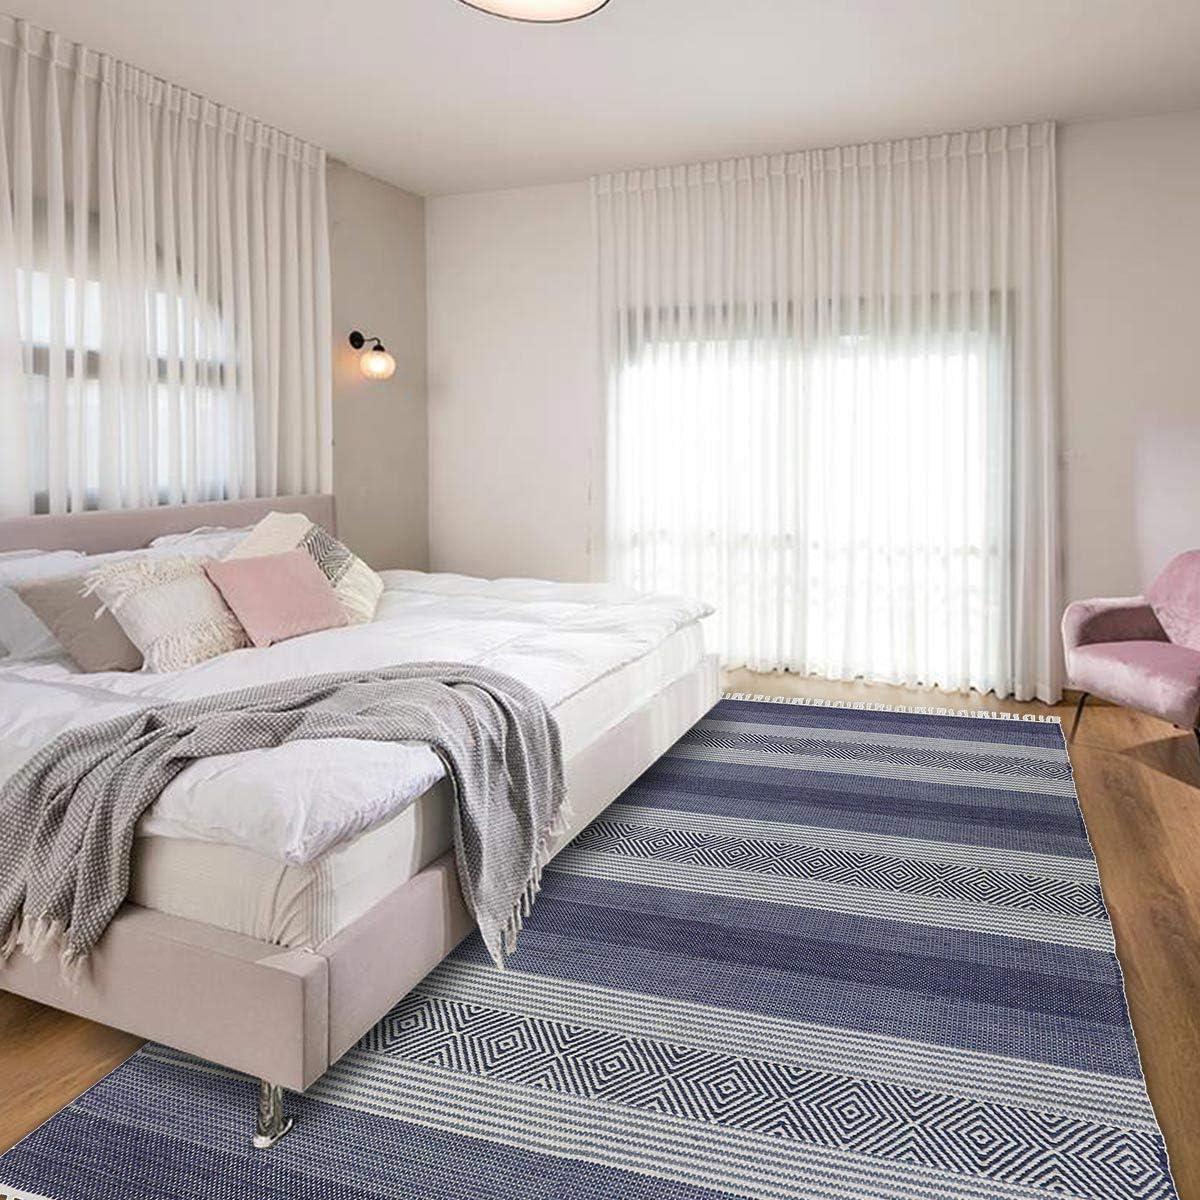 We Rugs Beautiful Area Rugs for Living Room Decor, Modern Geometric Handmade Area Rug, Blue 9 x 12